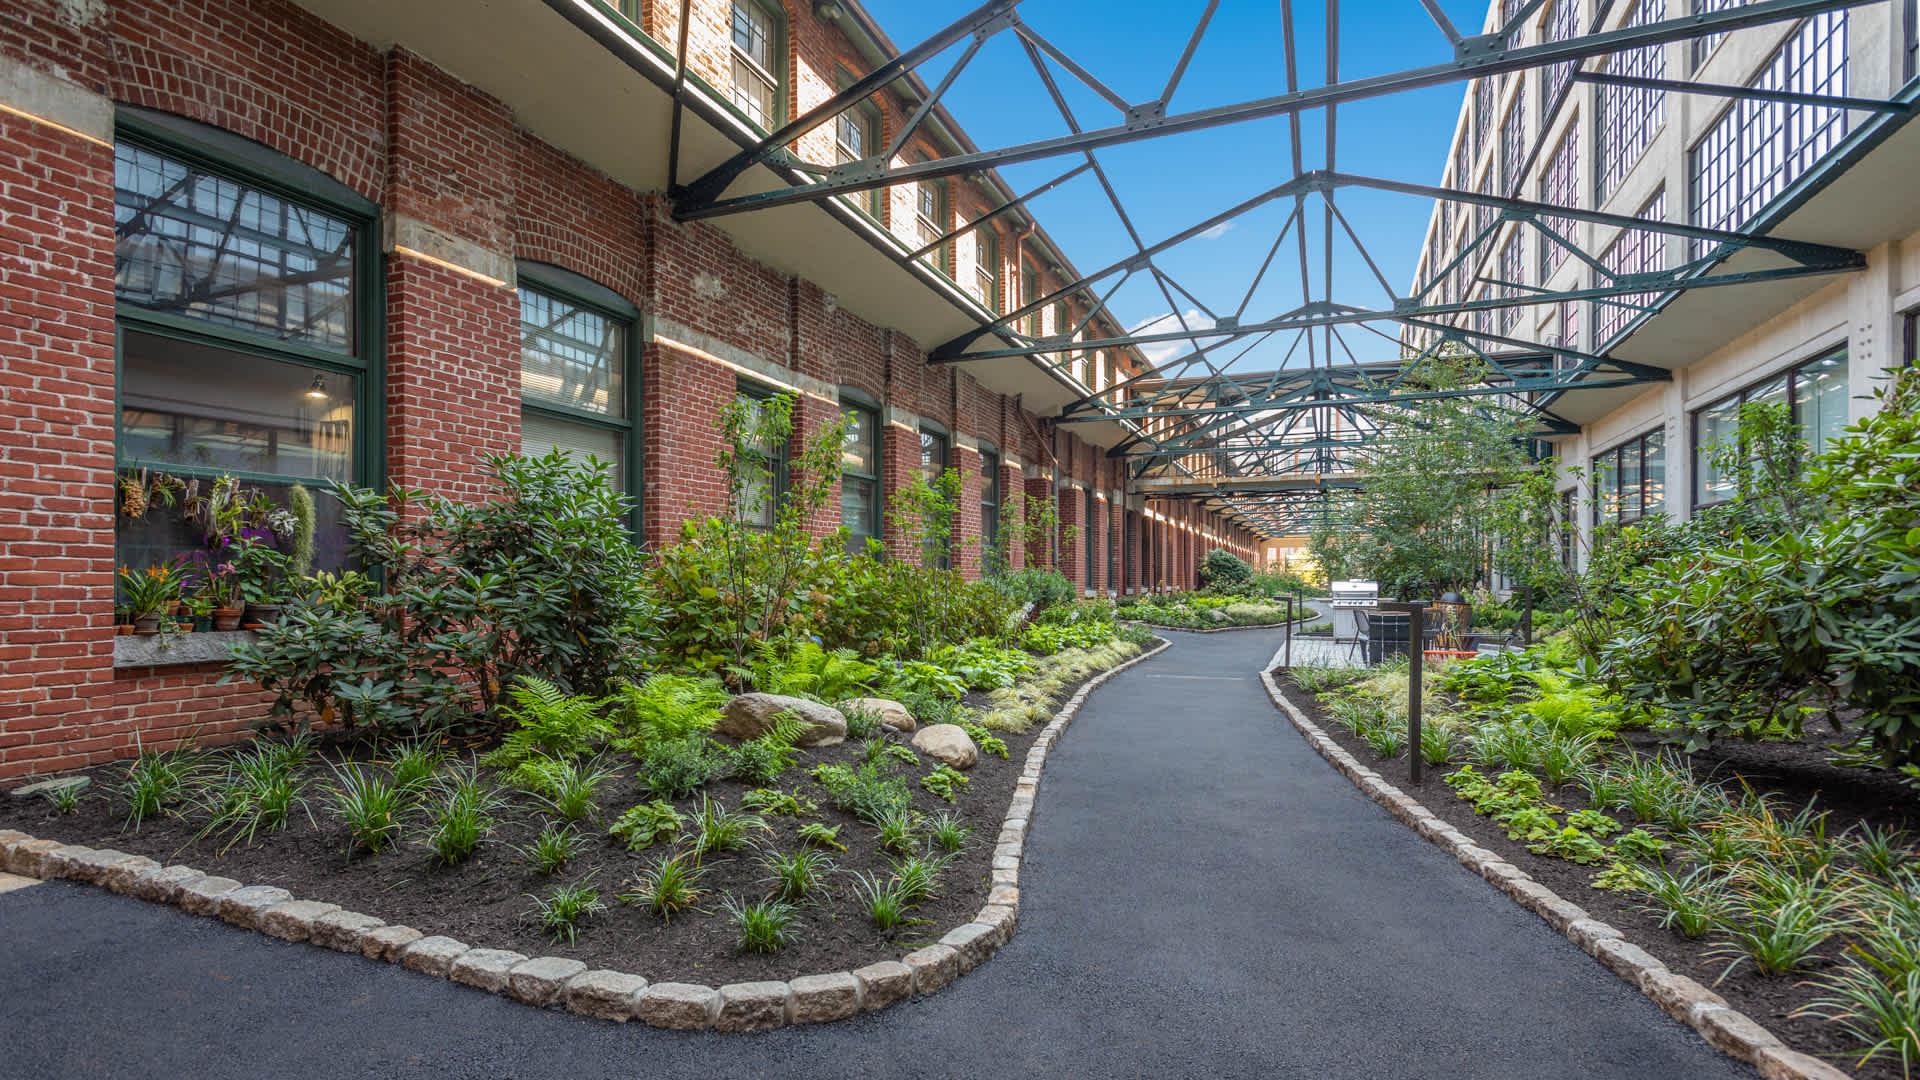 Lofts at kendall square apartments courtyard